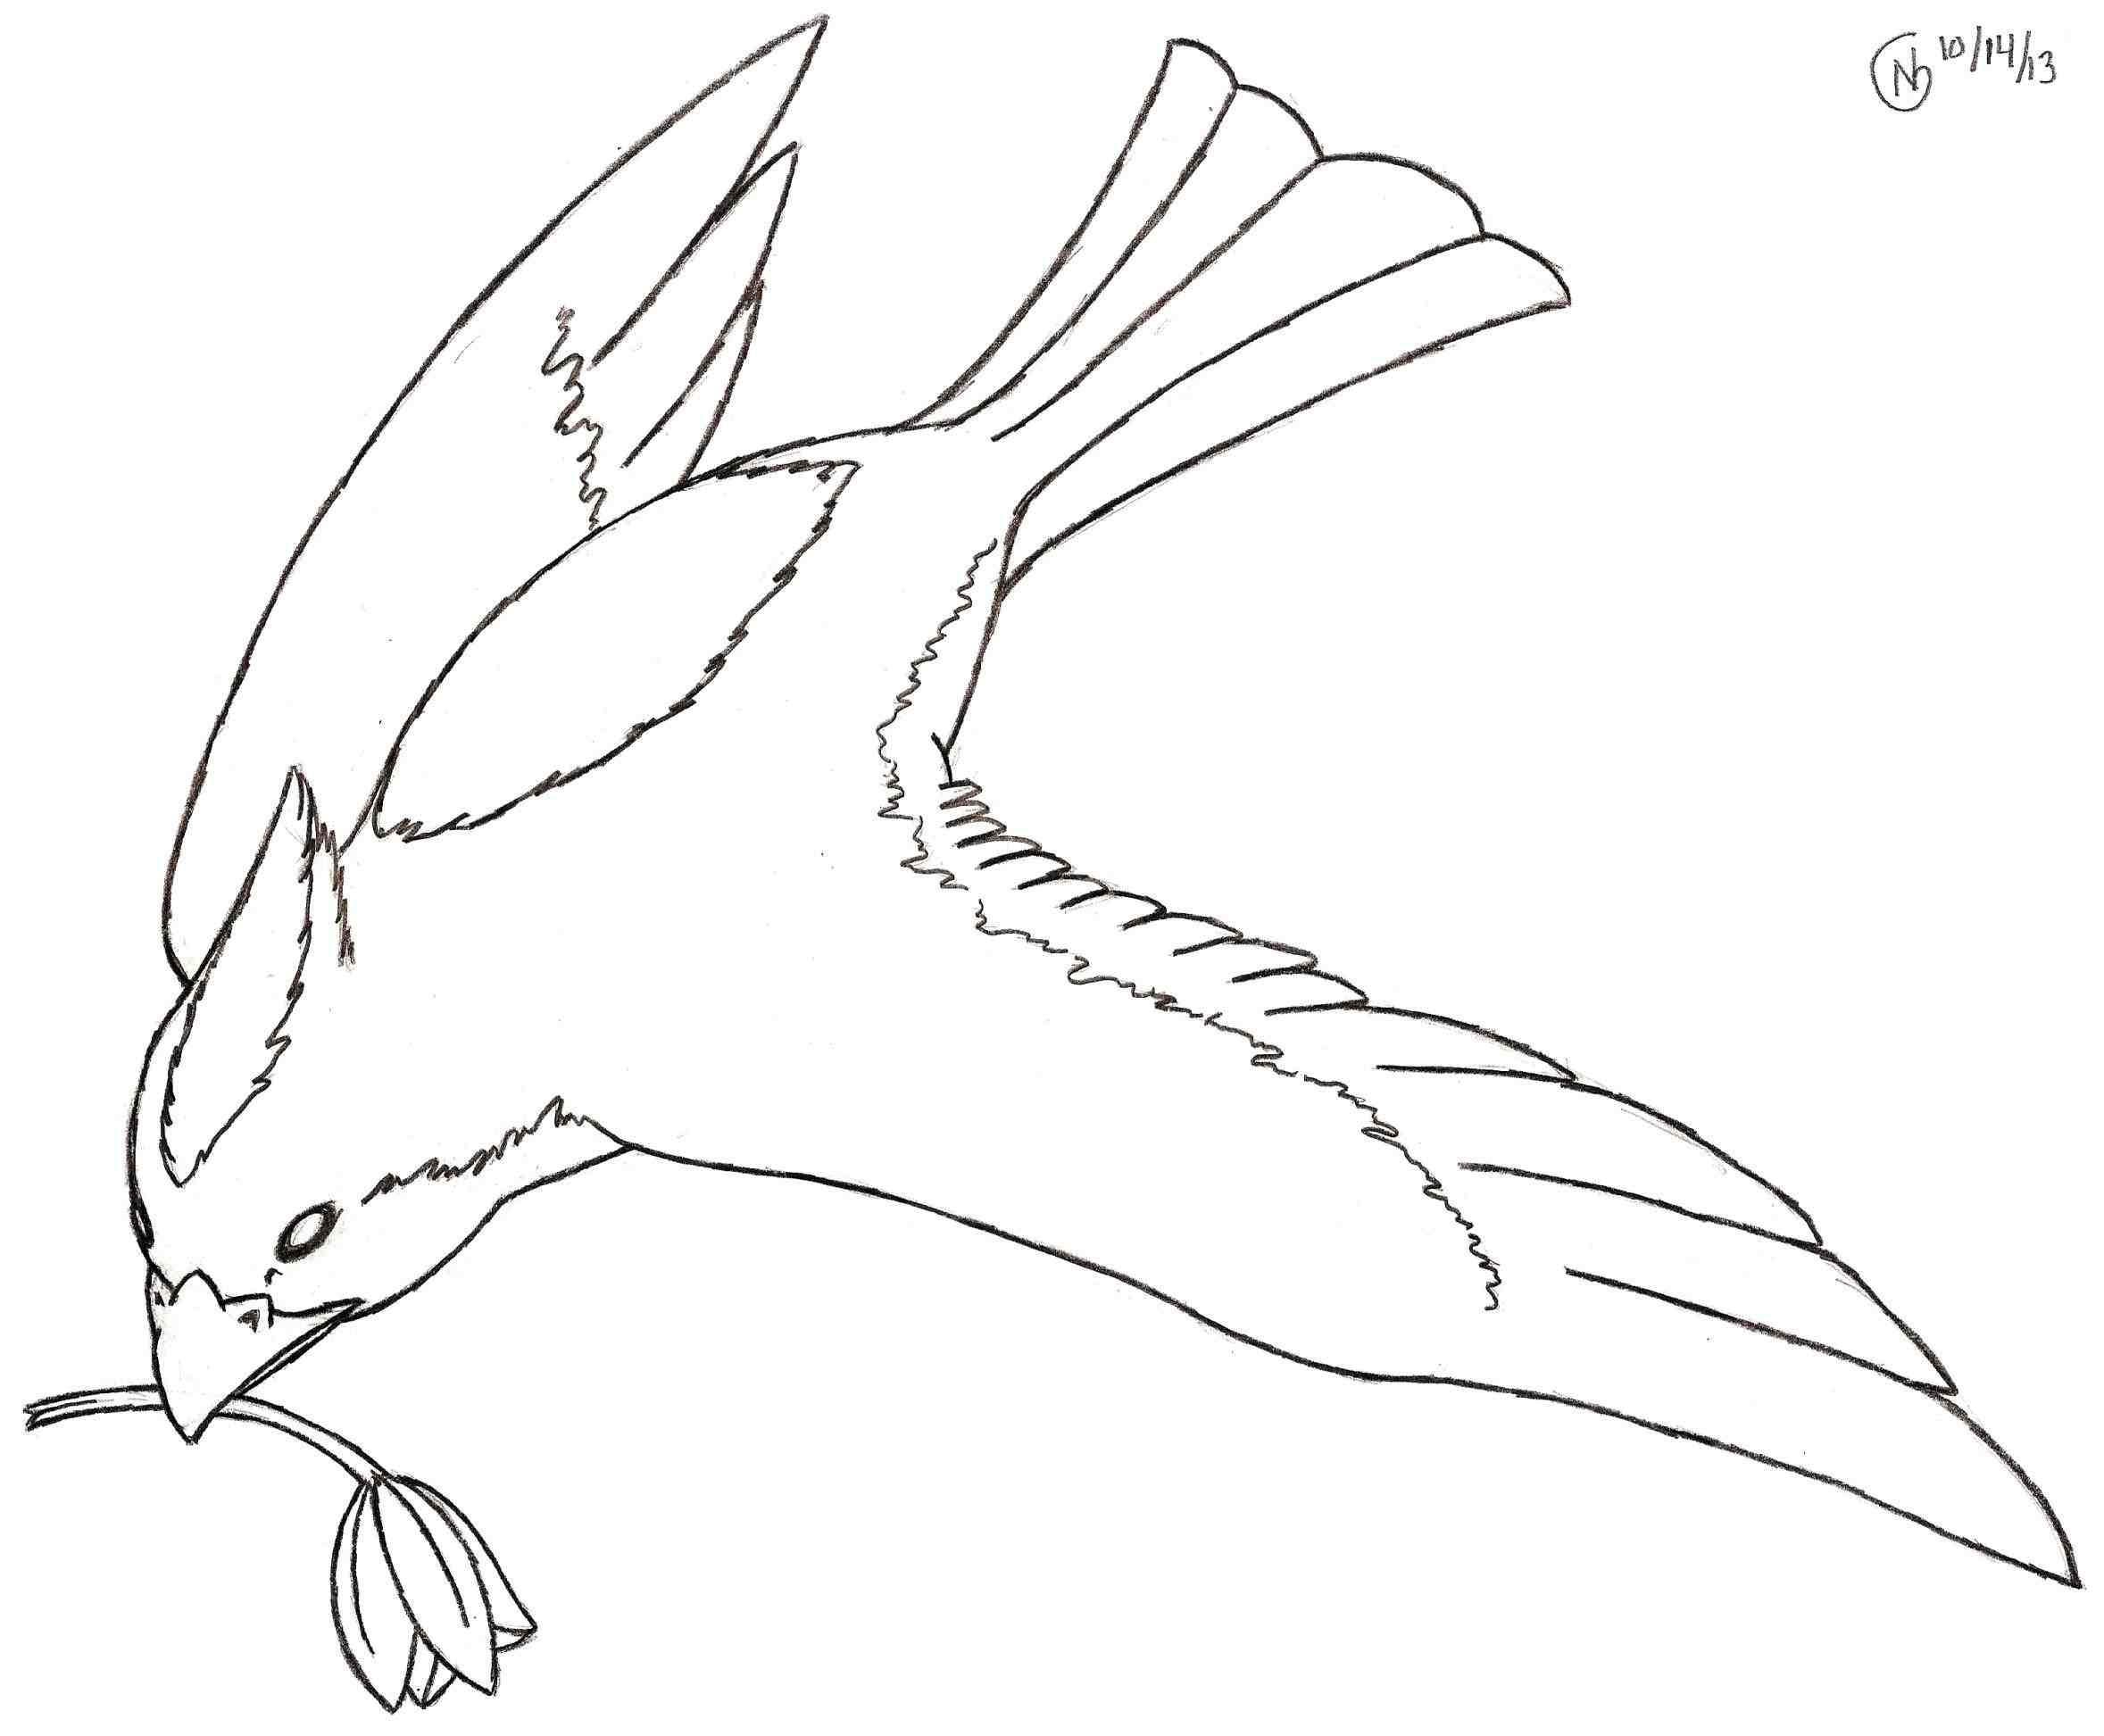 2357x1945 Drawing Of A Flying Bird Drawing Of A Flying Bird Flying Bird